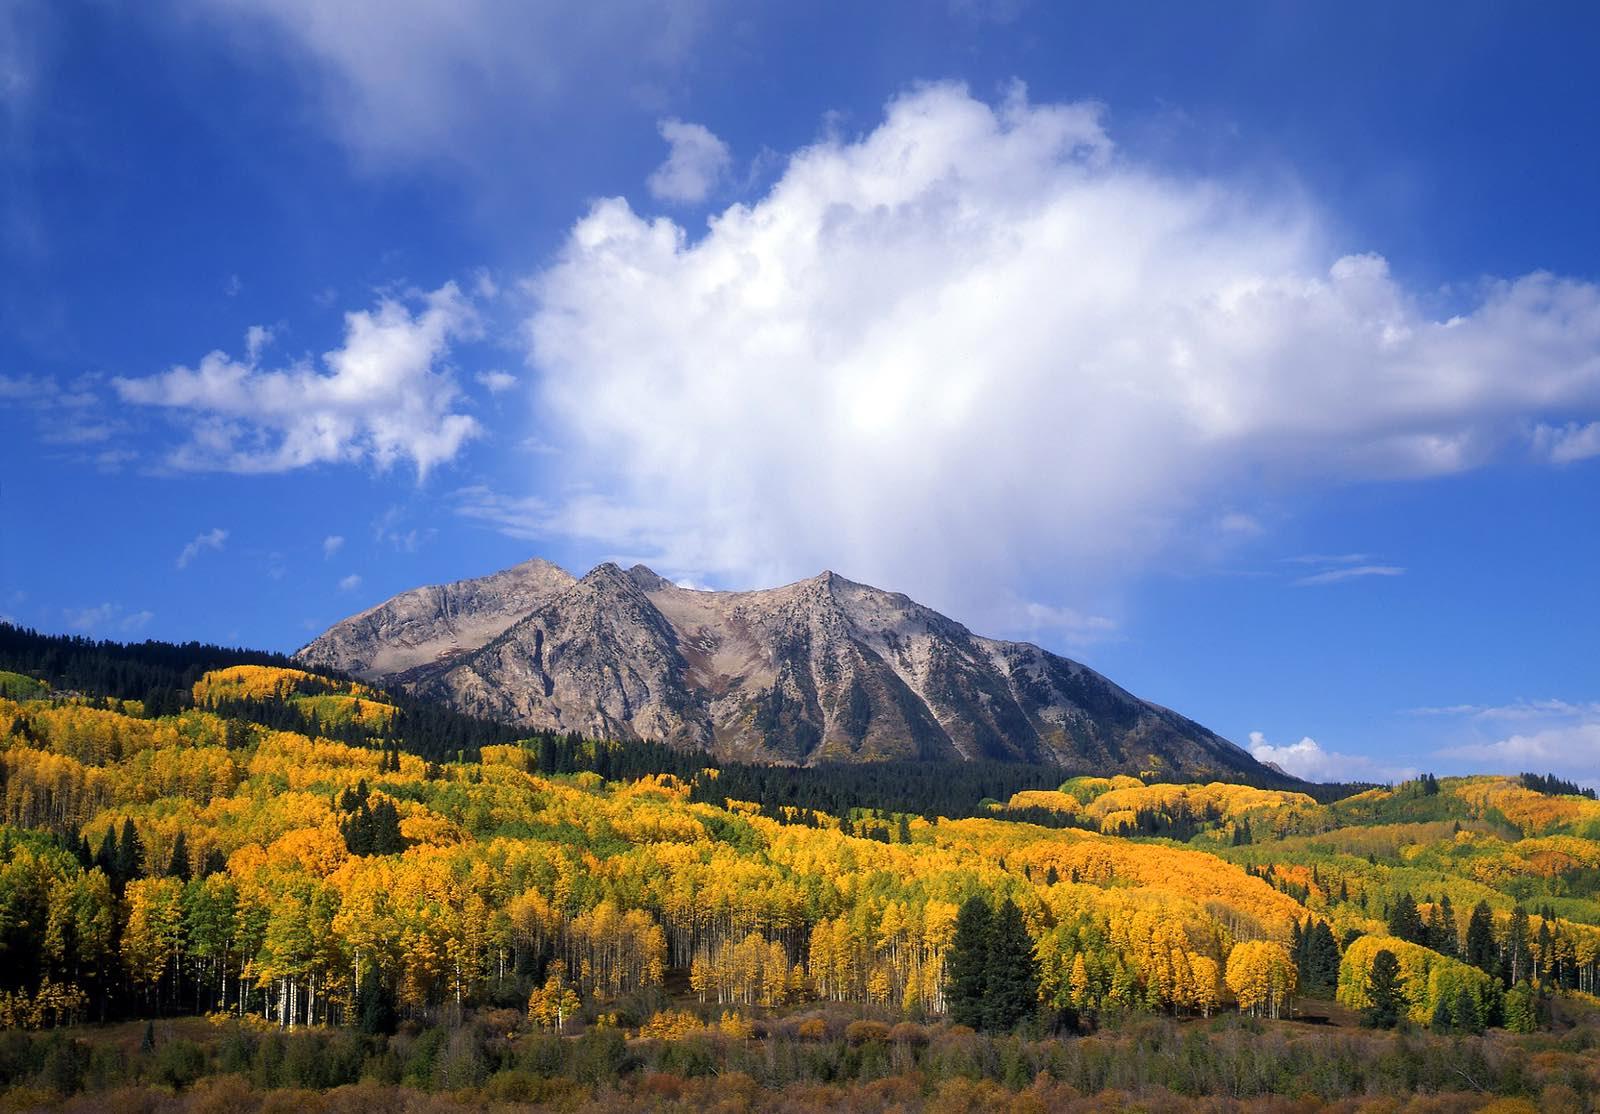 bigstock-Kebler-Pass-Mountains--Clouds-501668